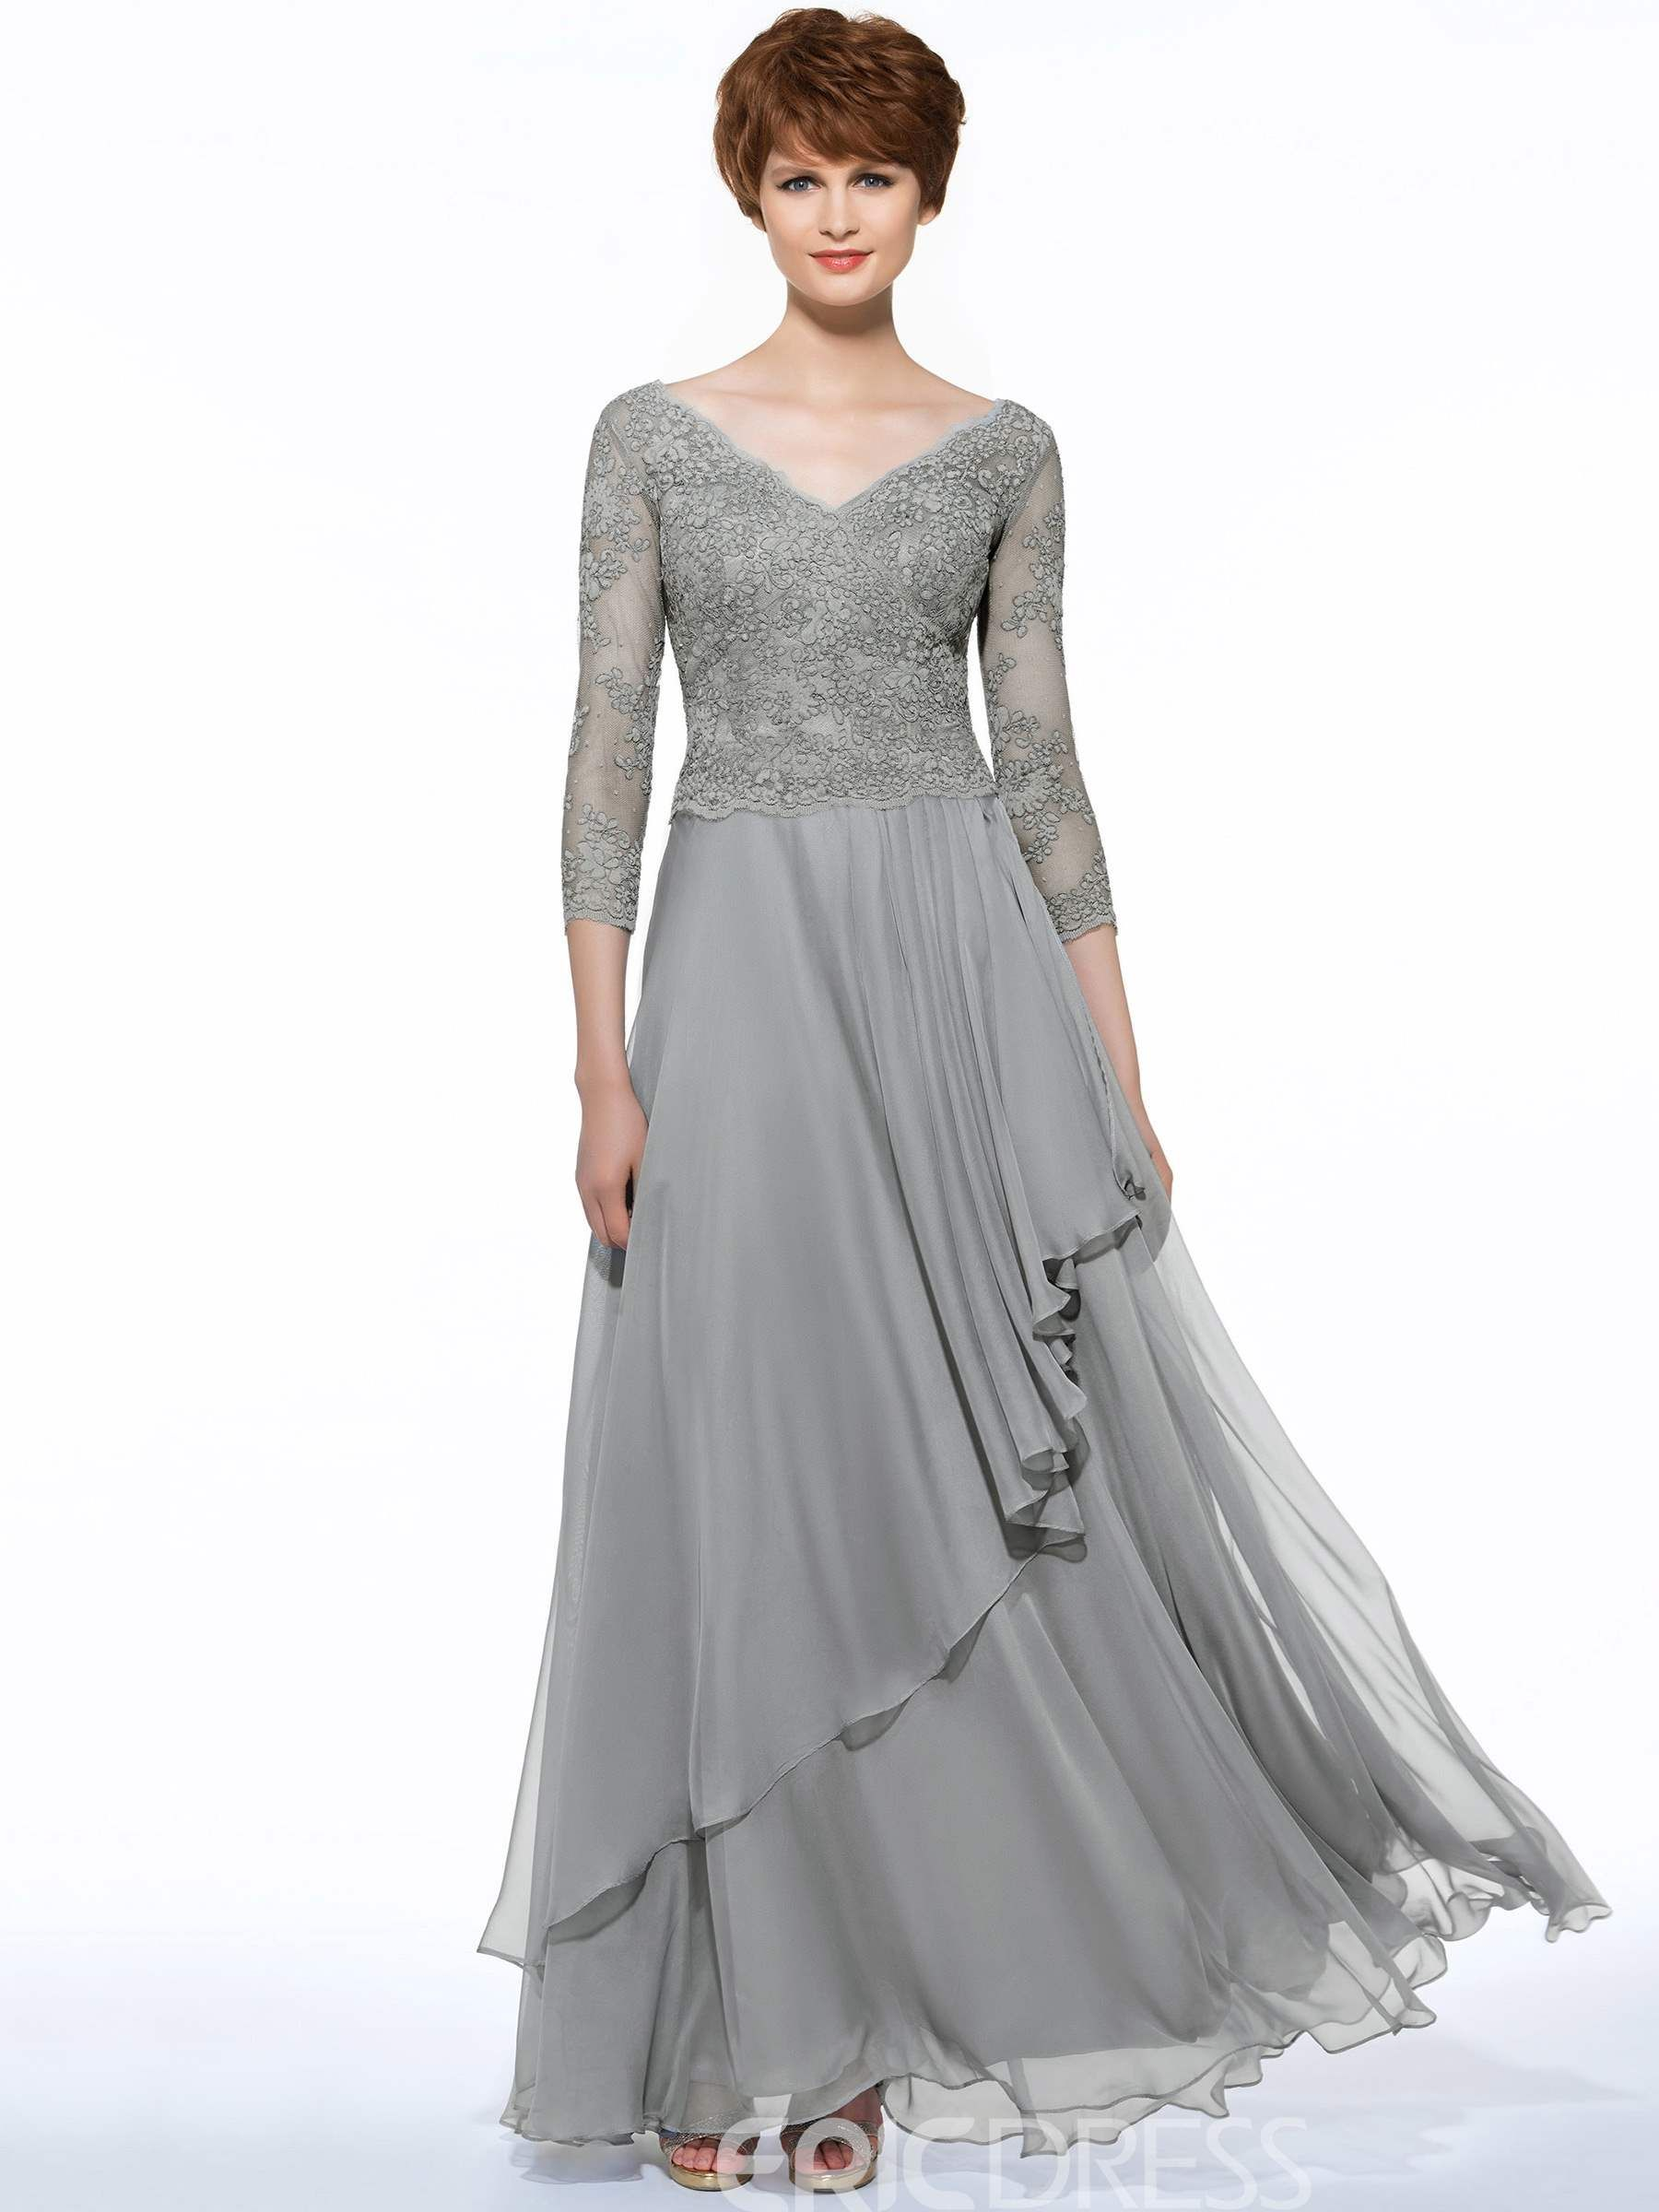 23de54f4c0e1 Ericdress Elegant V Neck 3/4 Length Sleeves Lace Long Mother Of The Bride  Dress